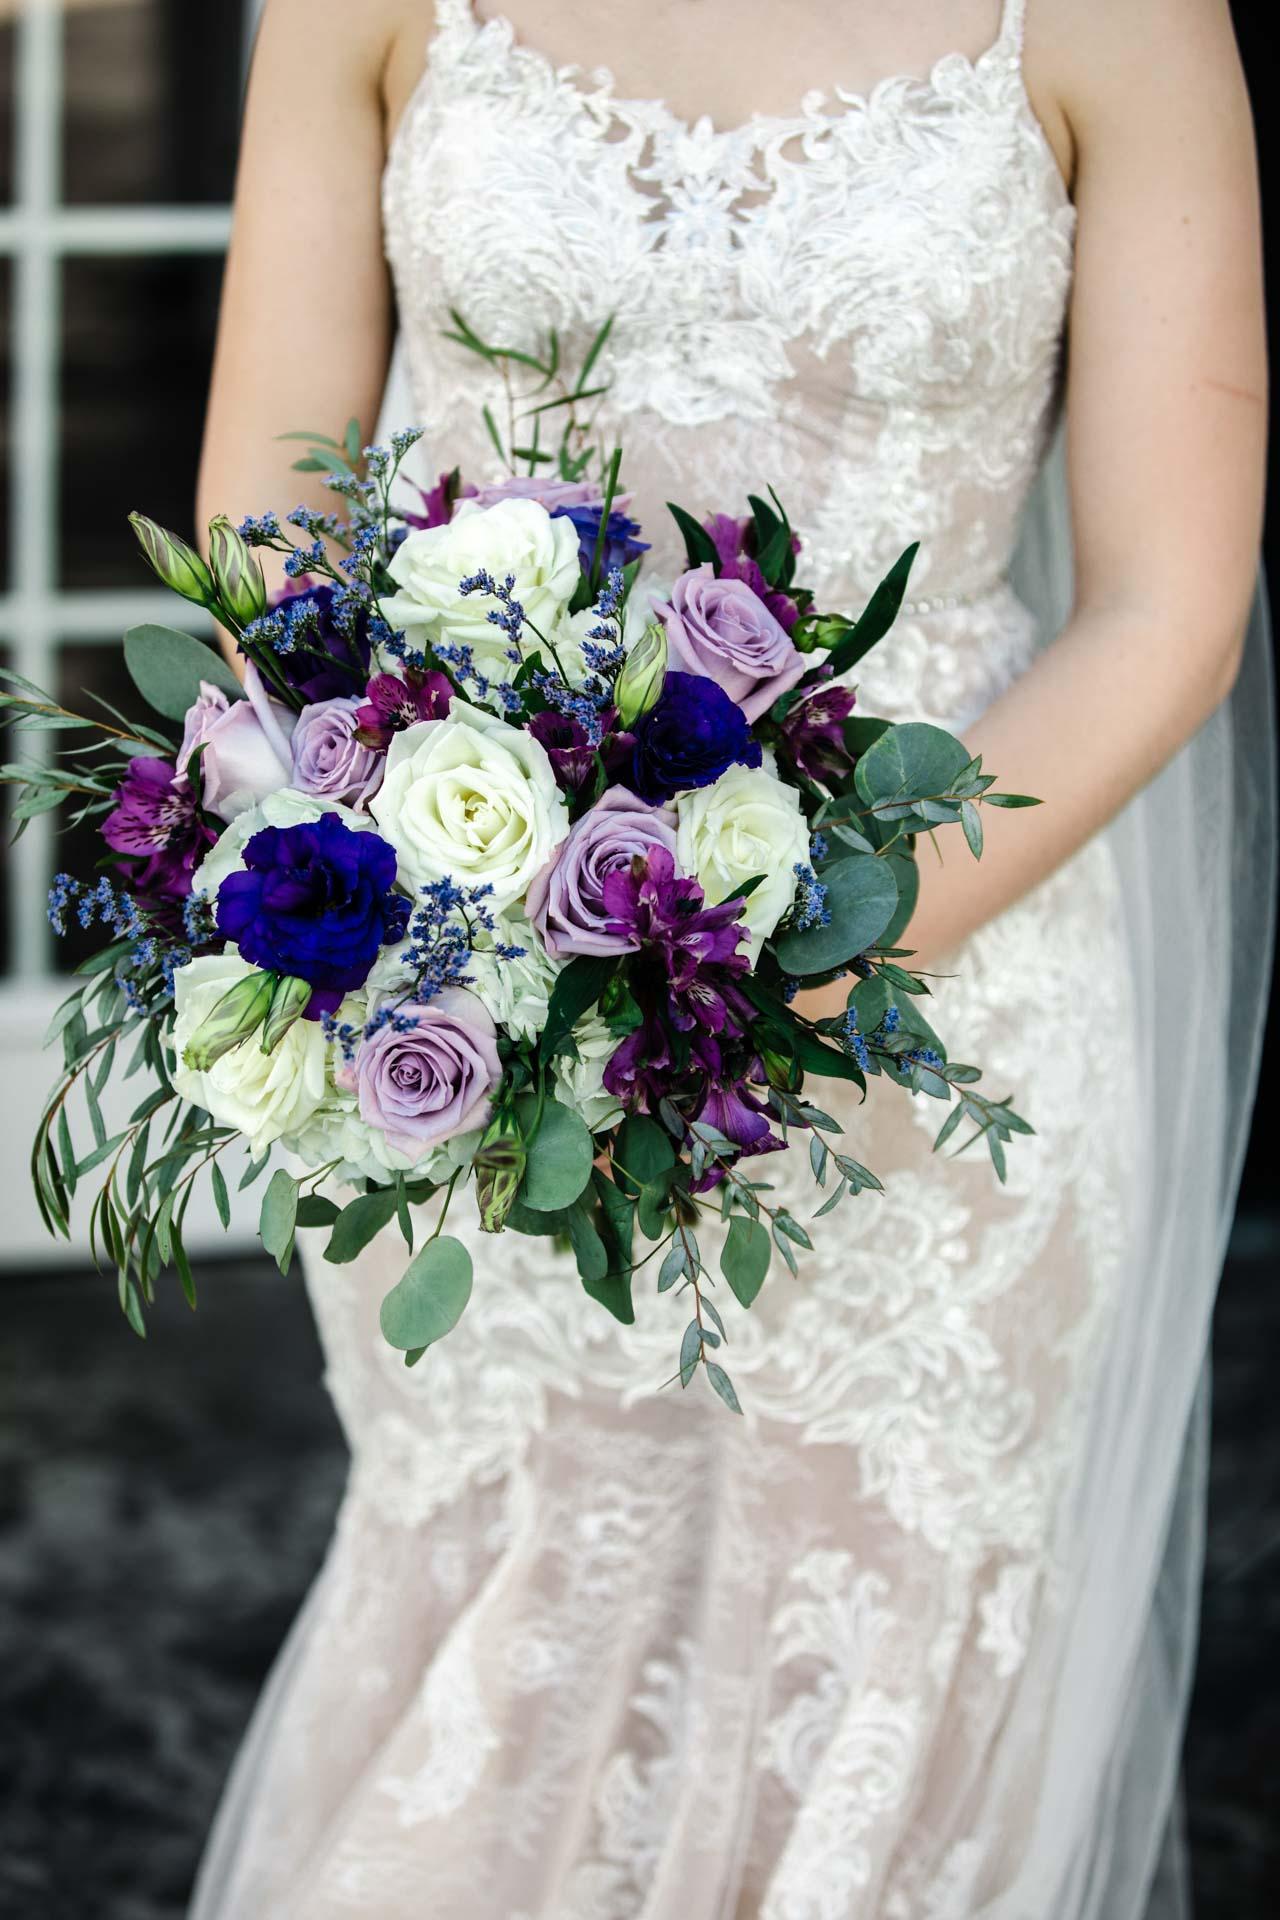 Wedding, bride, flowers, dress